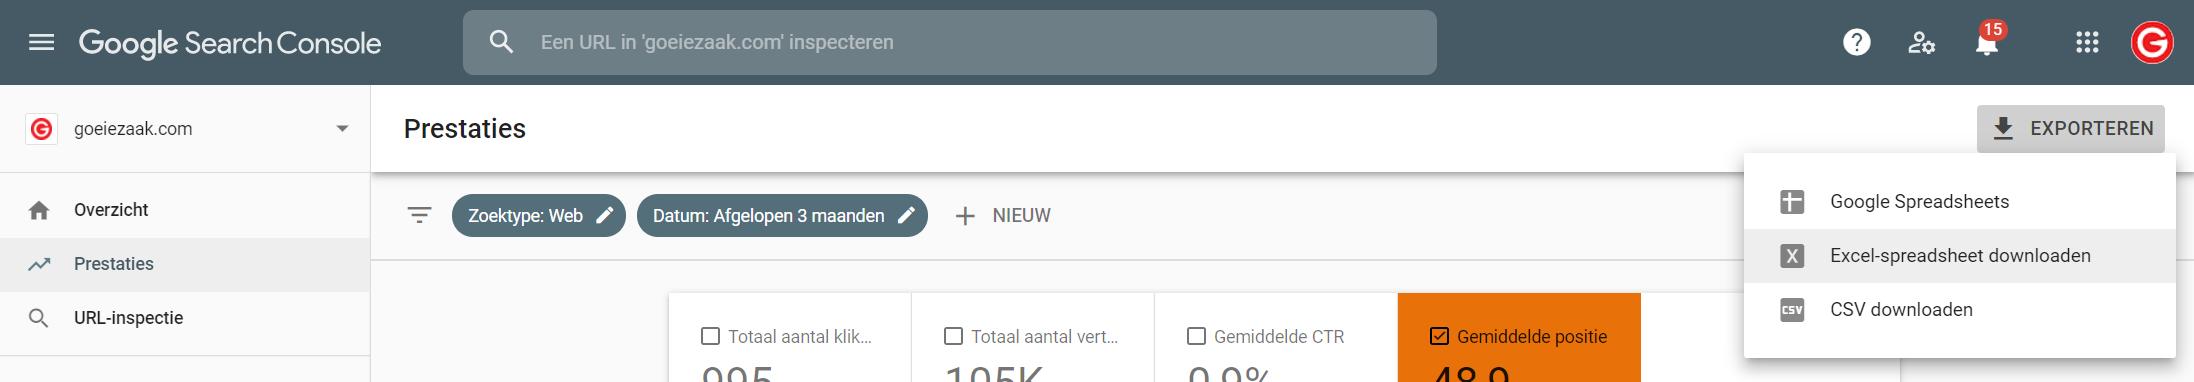 Google Search Console Excel spreadsheet downloaden